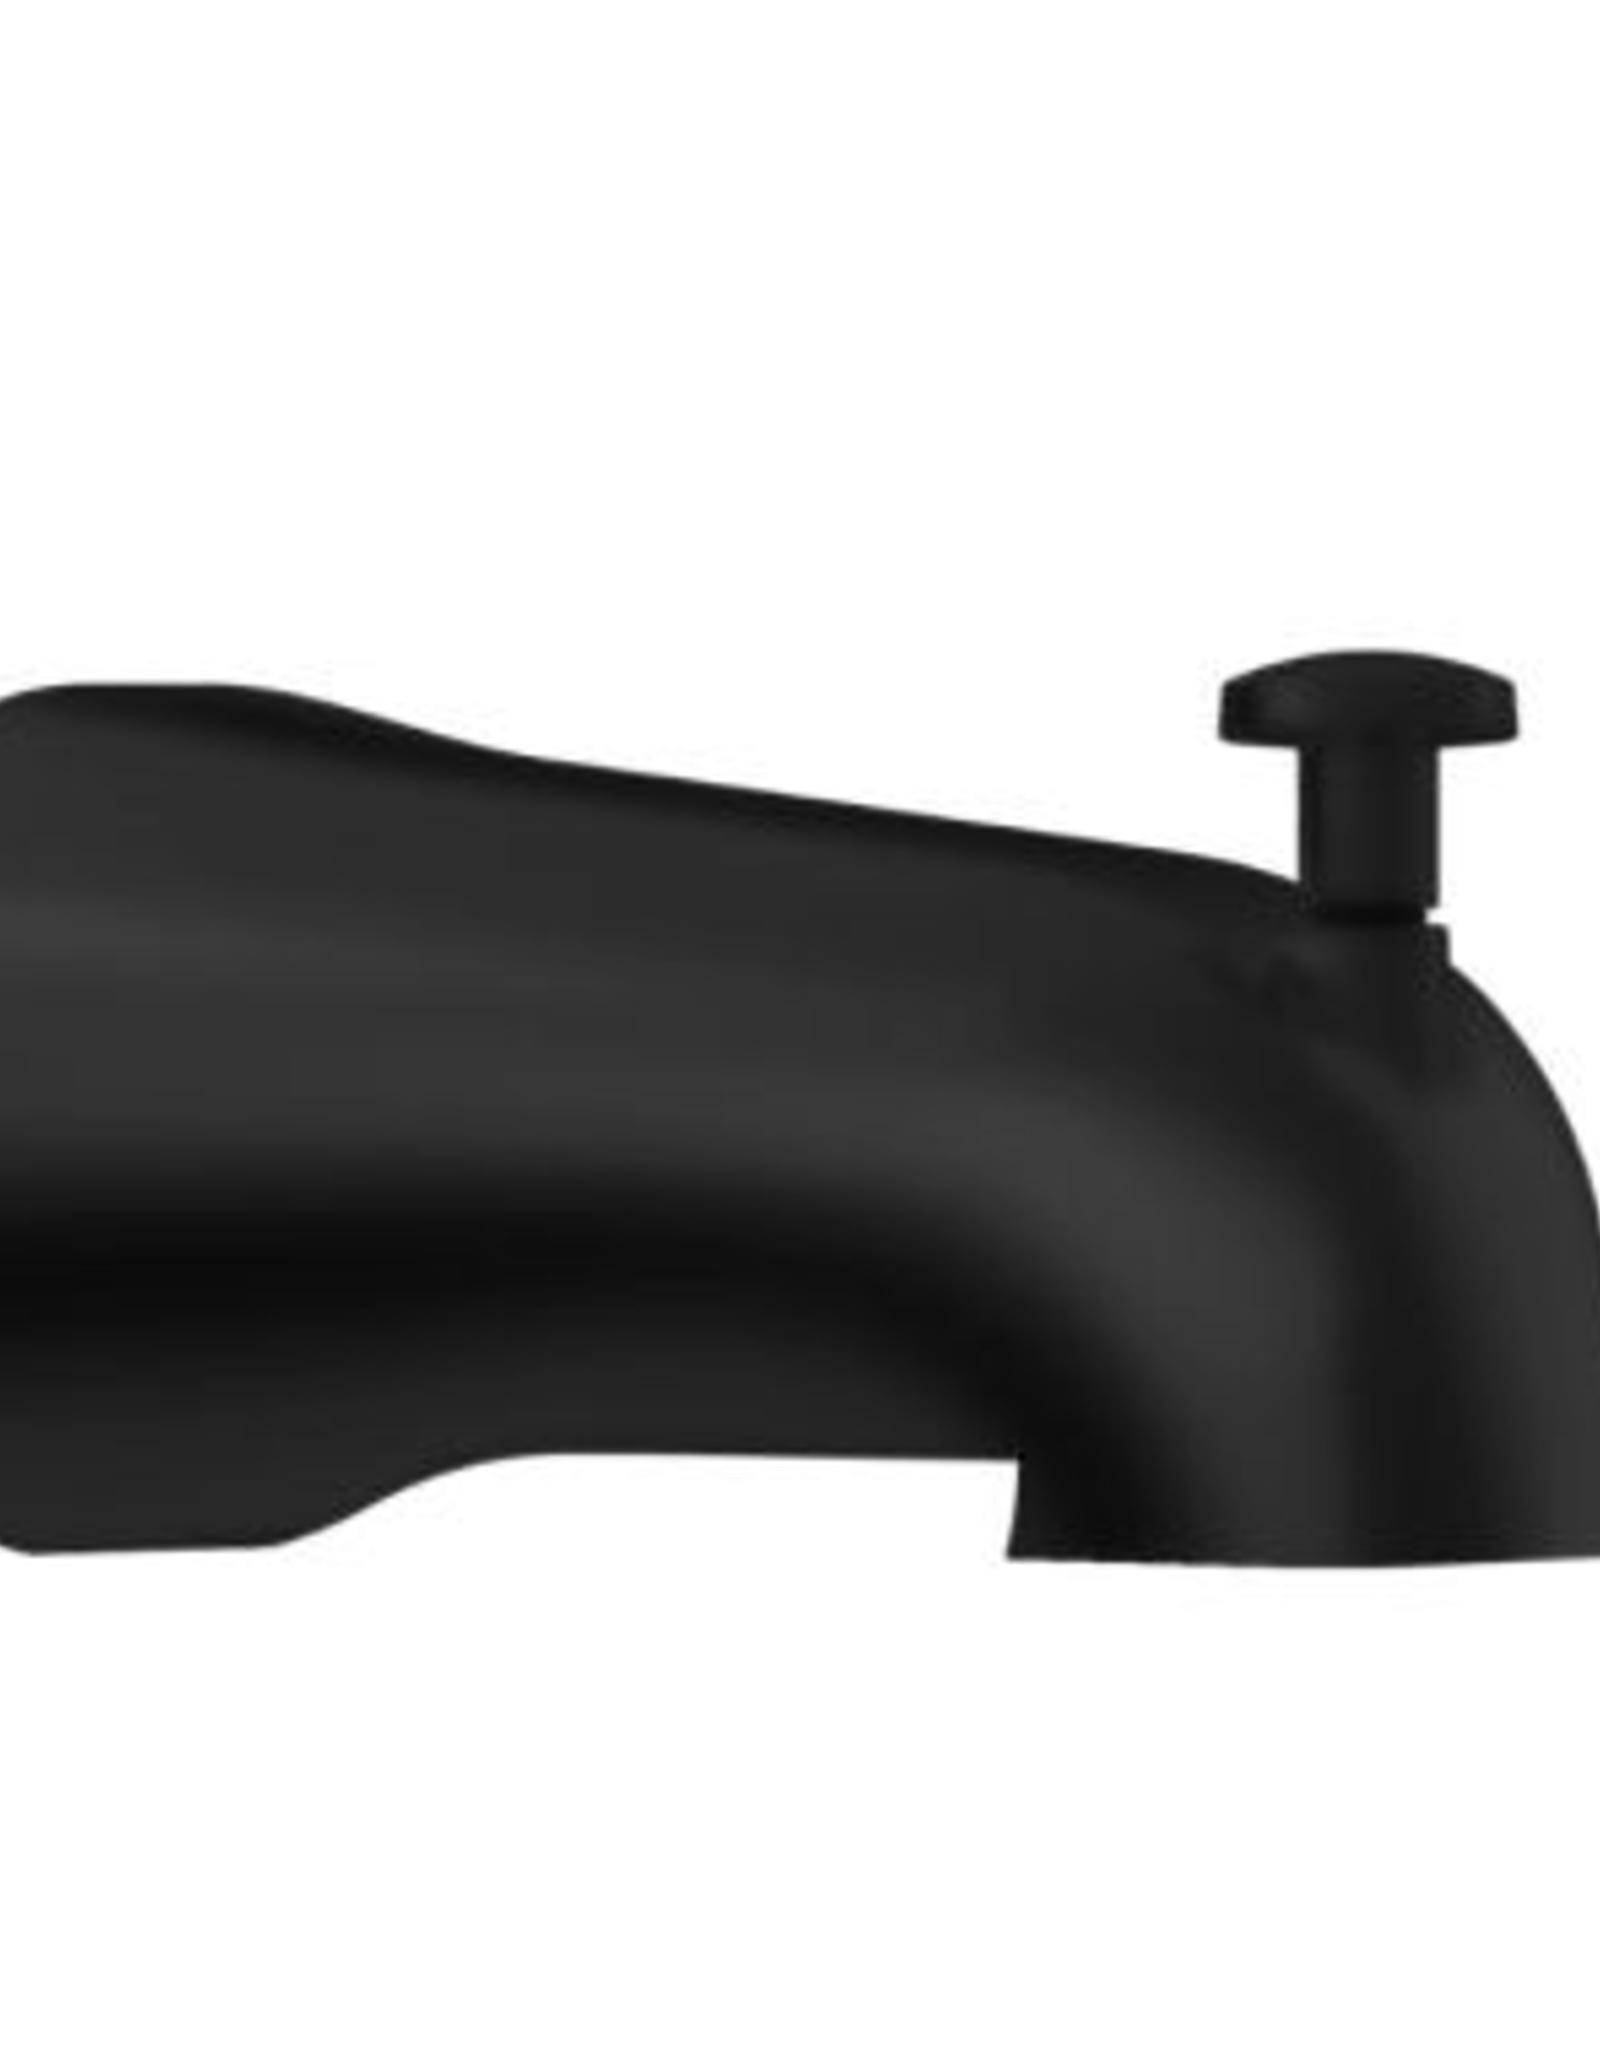 Kalia Sobrio PB6- Hand Shower w/ Diverter Tub Spout- Matte Black